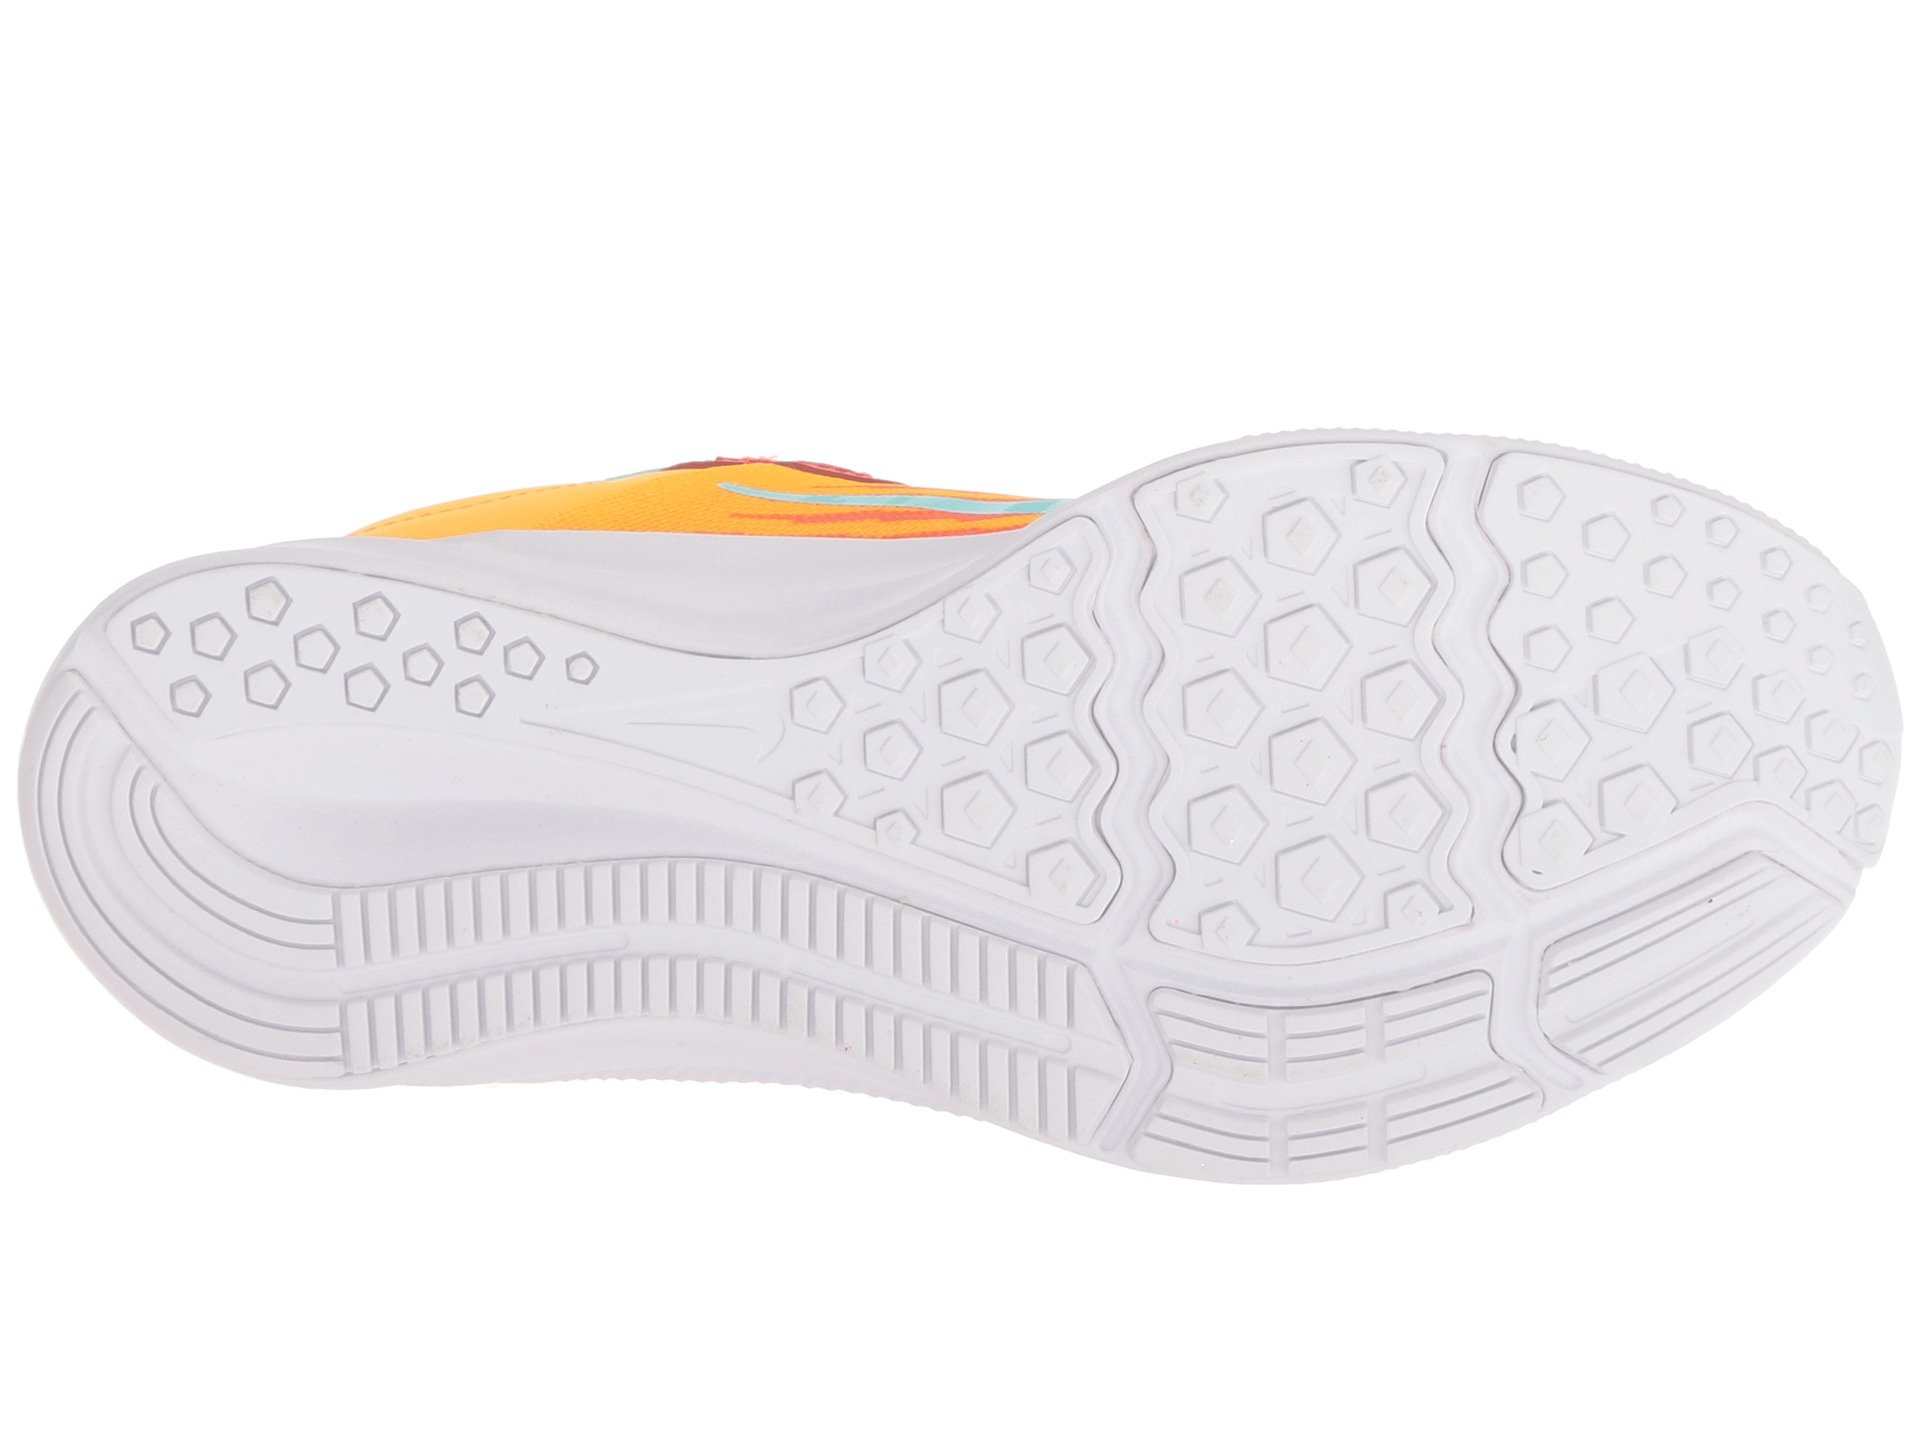 Nike Kids' Preschool Downshifter 8 Fade Running Shoes (1.5, Red/Green) by Nike (Image #4)